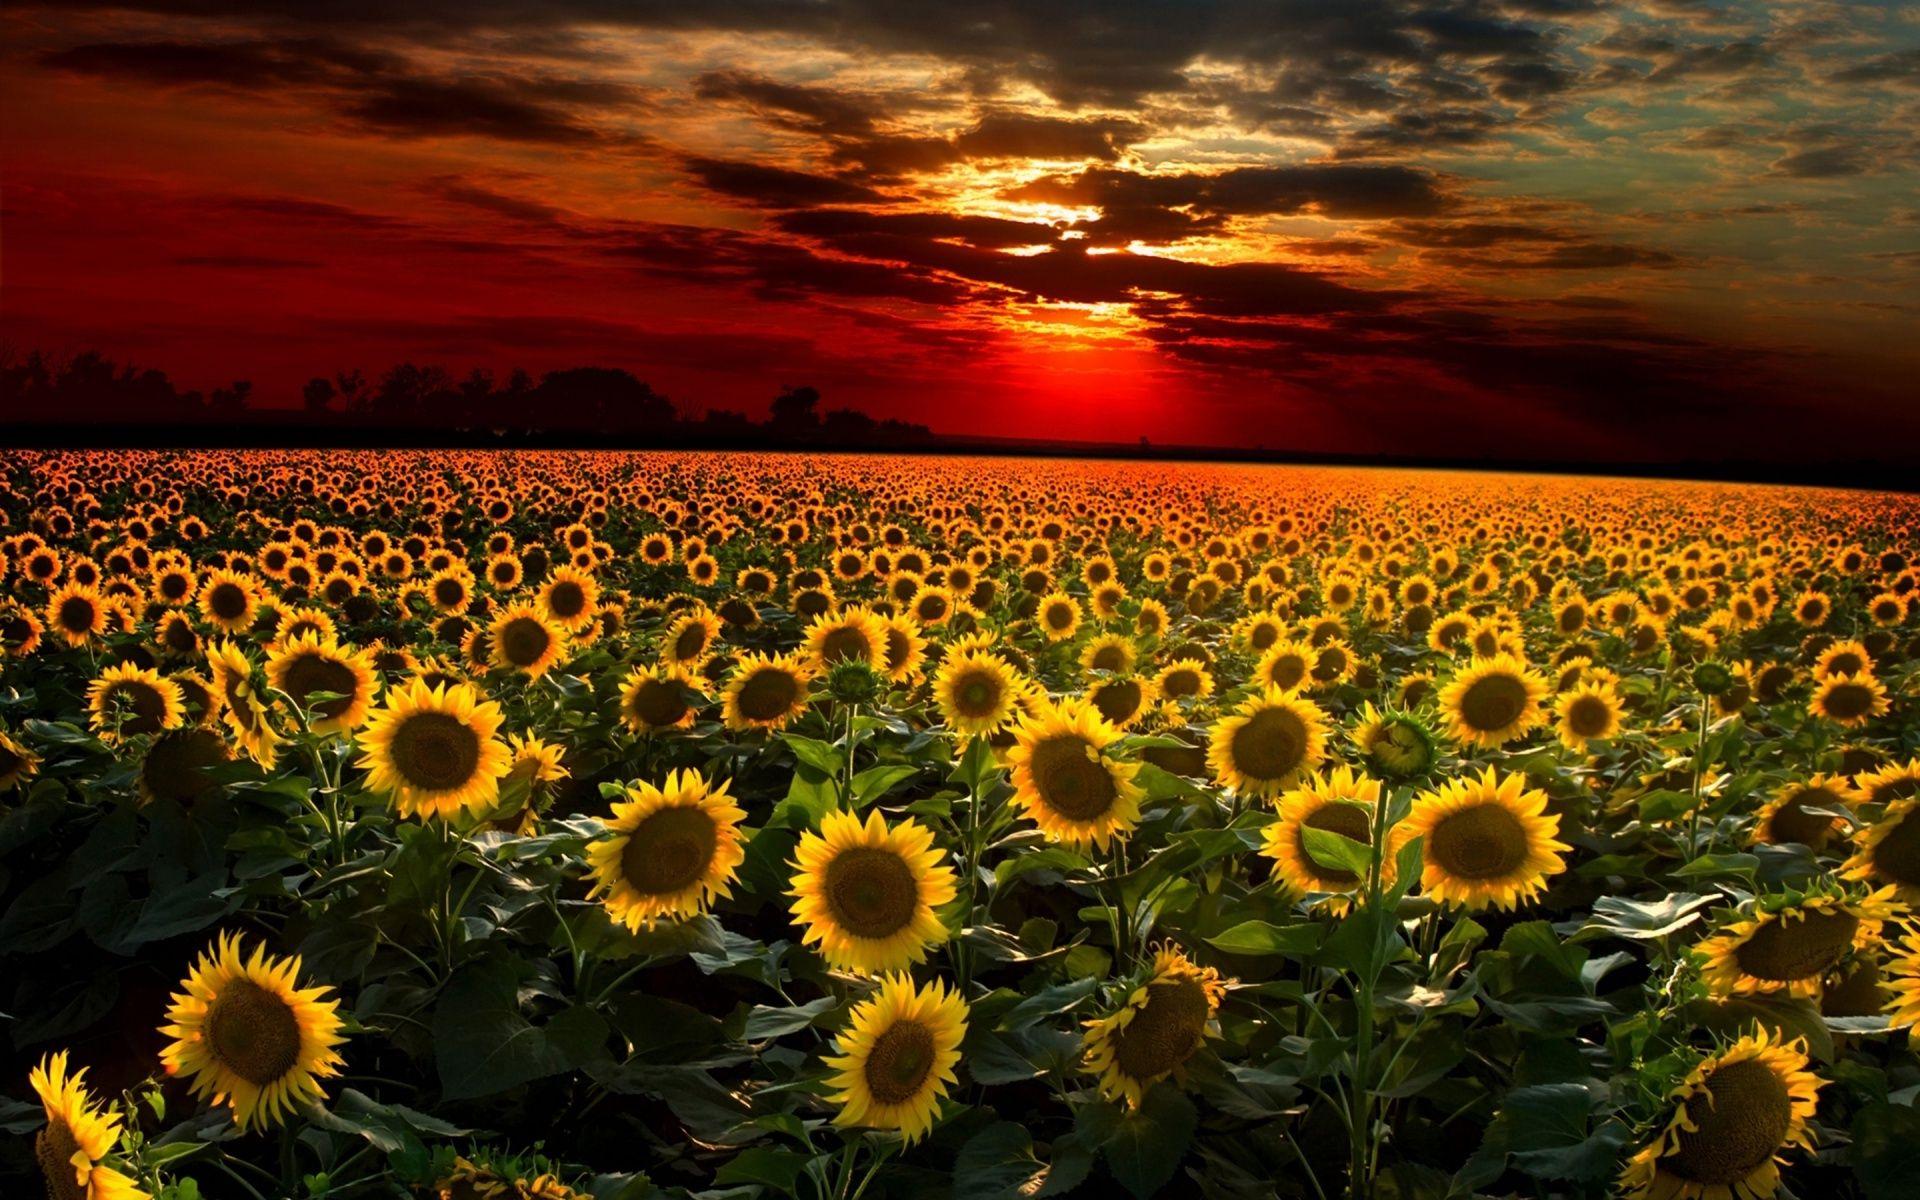 89+ Field Of Sunflowers Wallpapers on WallpaperSafari